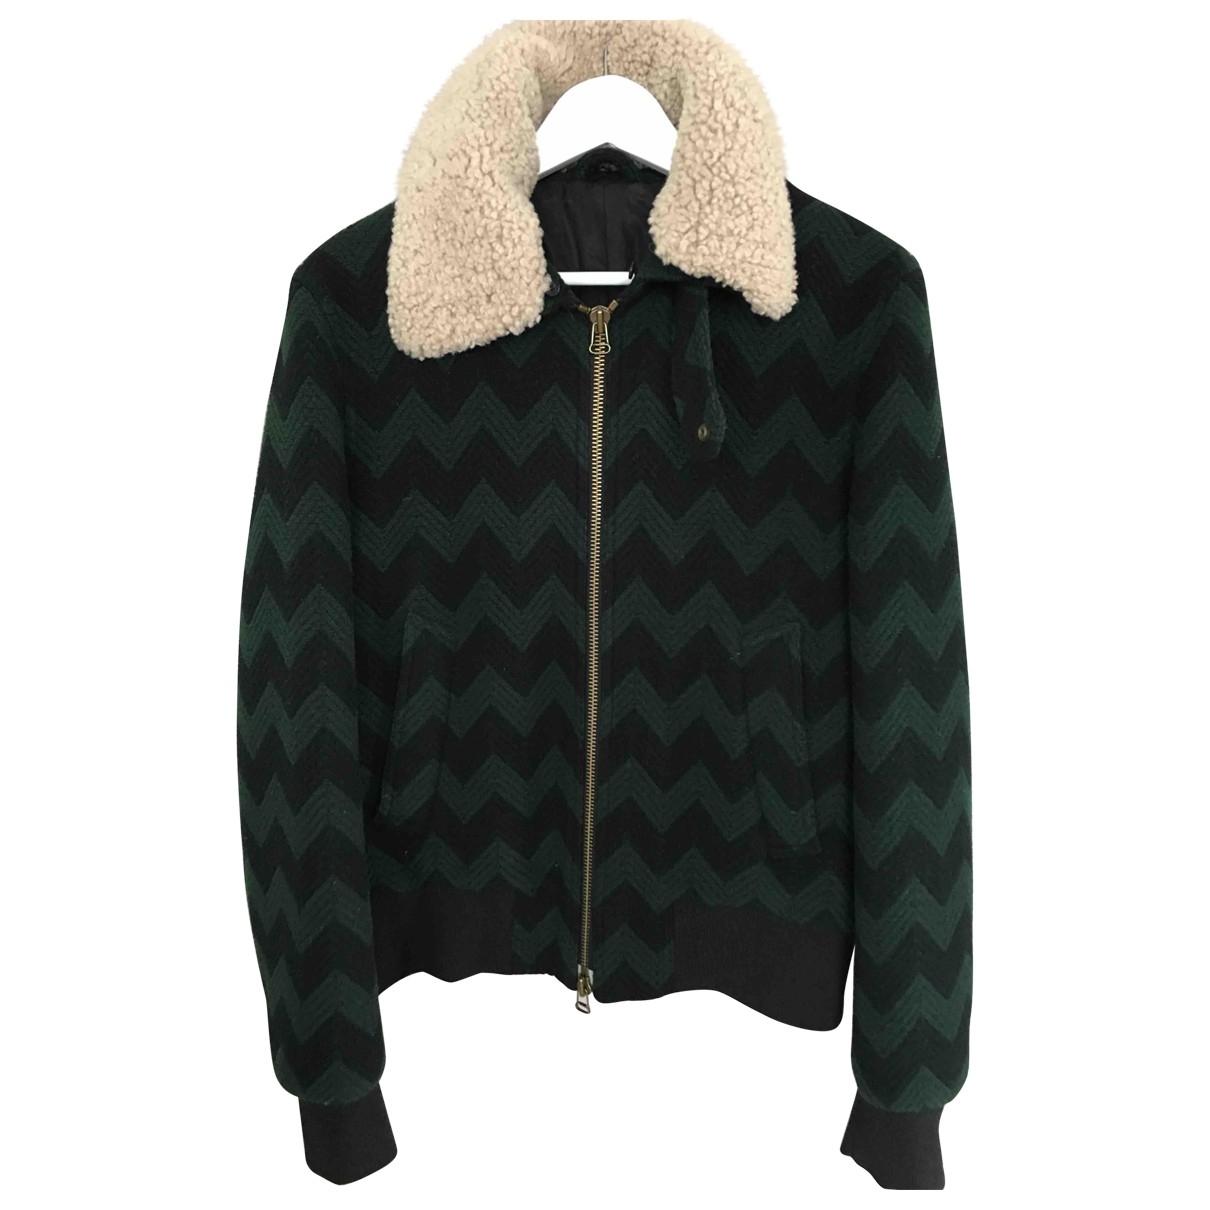 Ami \N Green Wool jacket  for Men M International